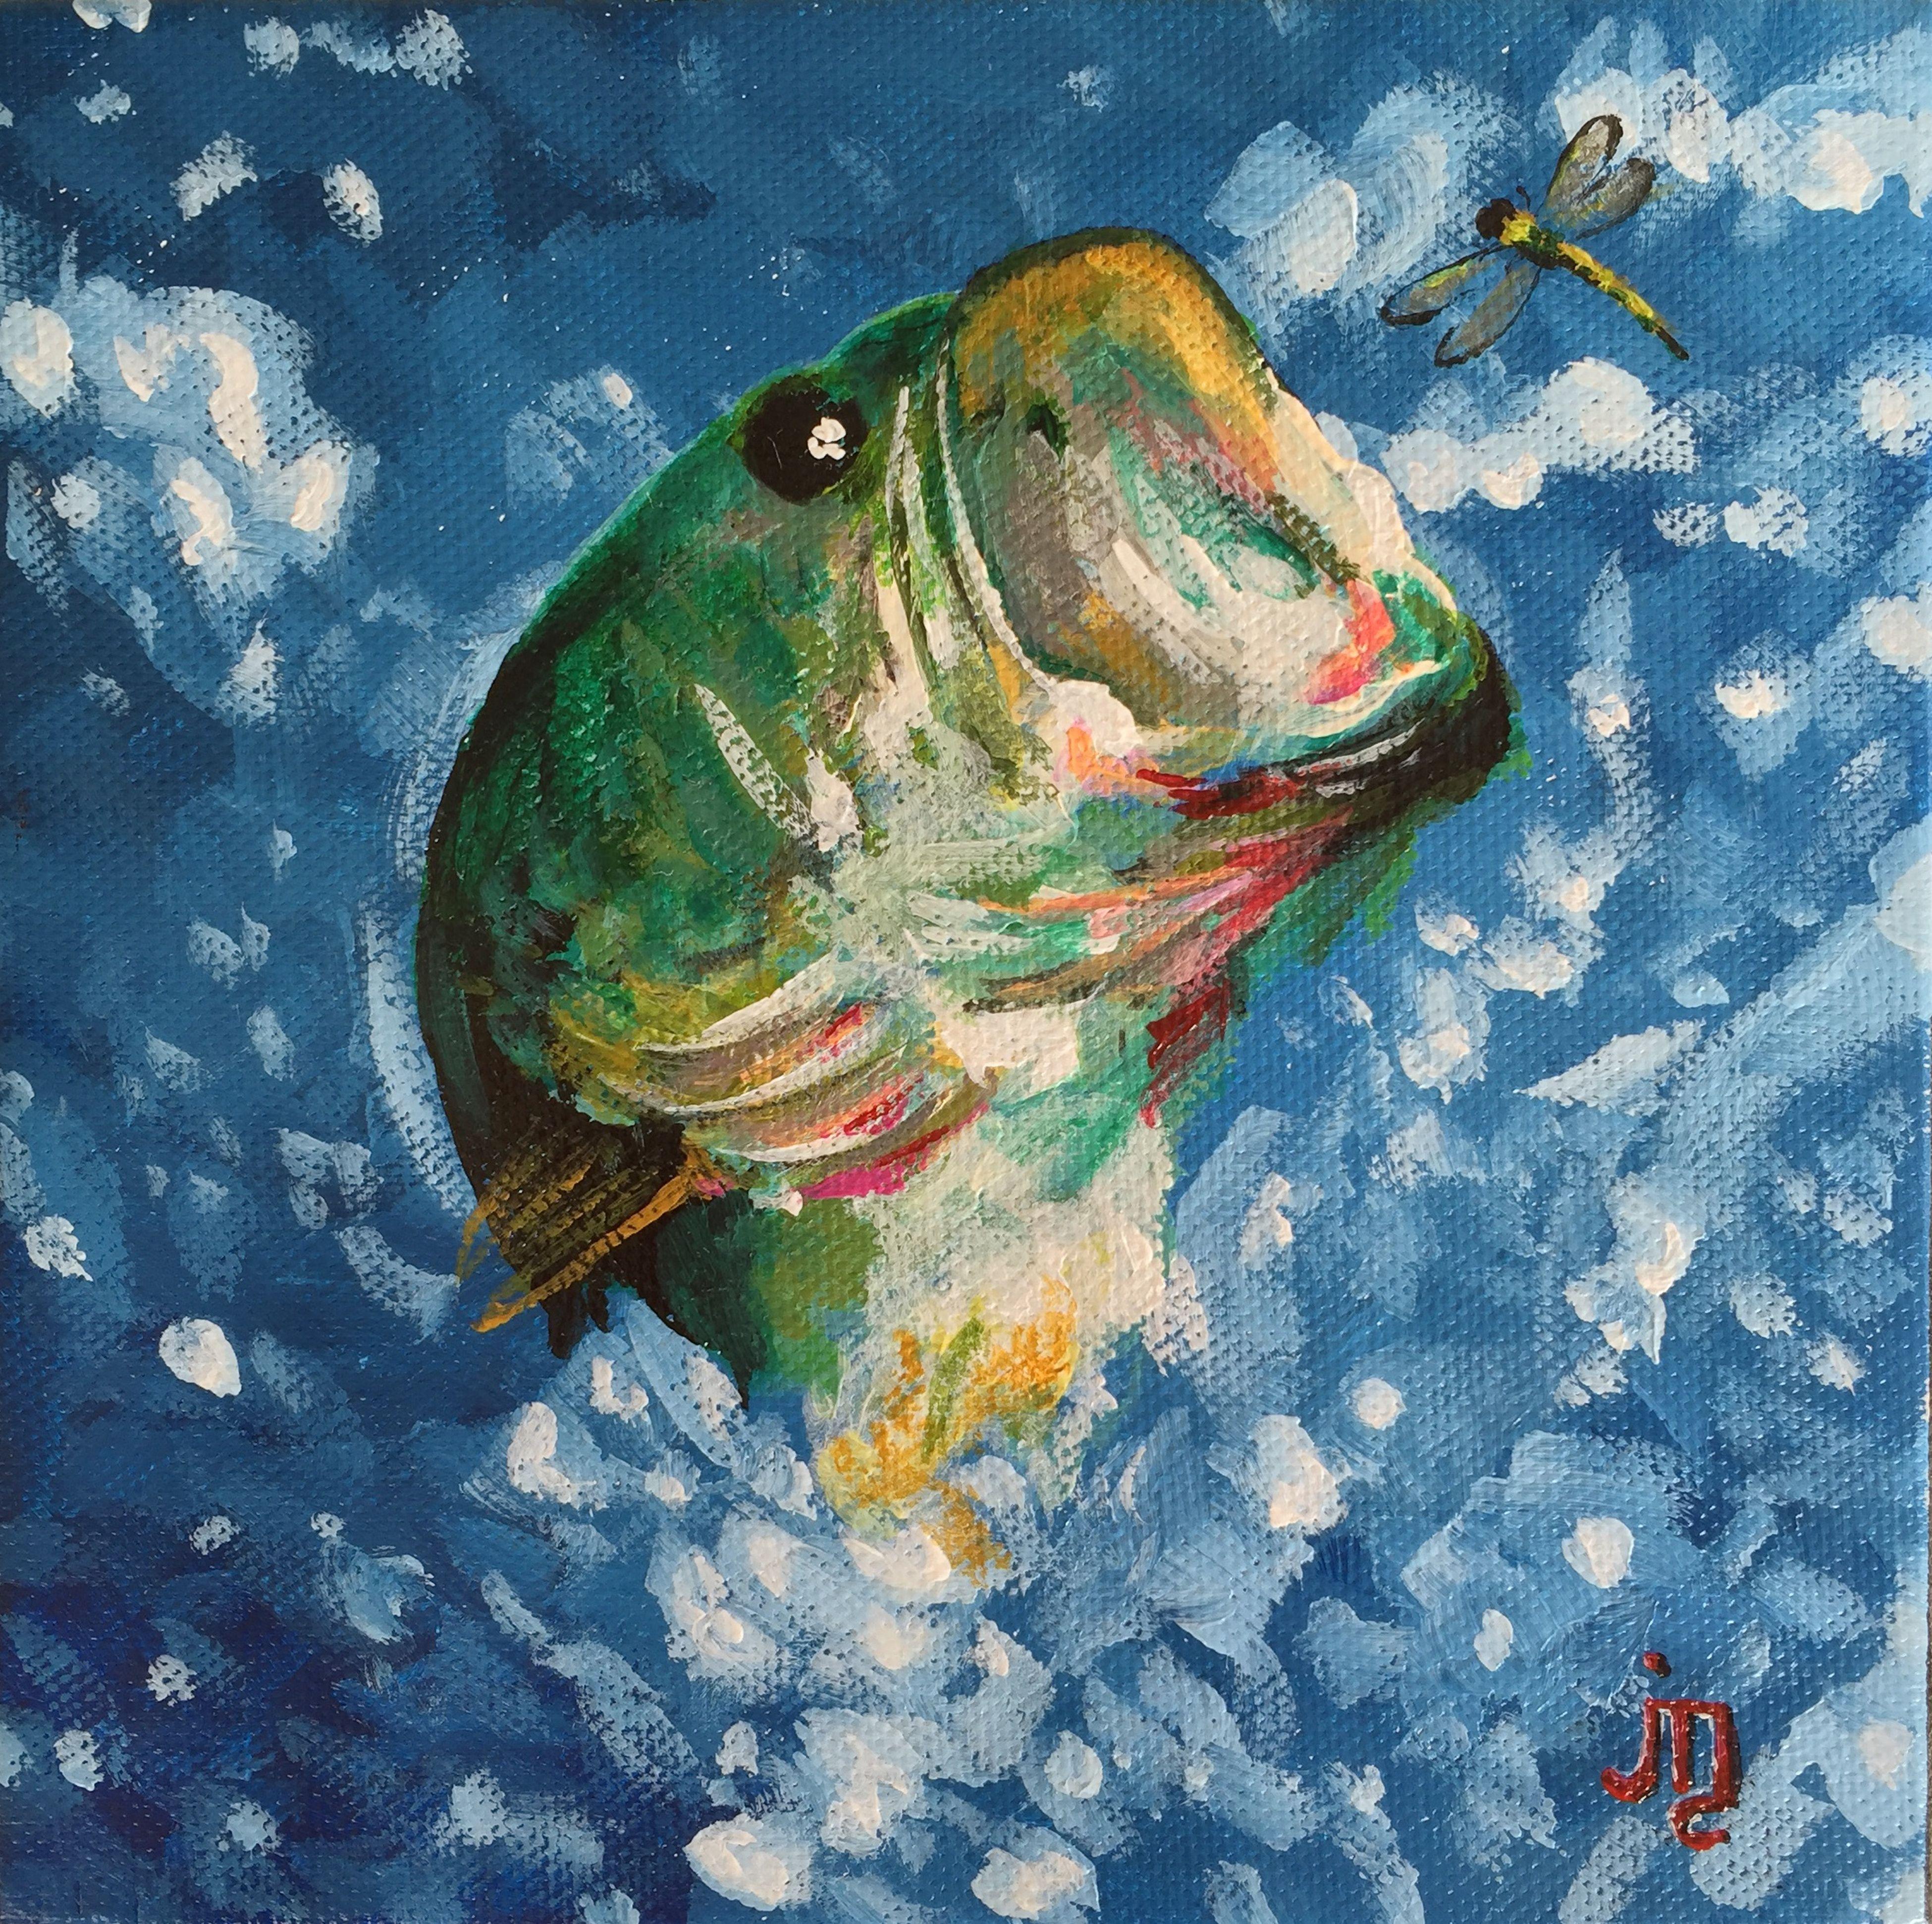 """A Quick Bite"" - J. Travis Duncan J Travis Duncan My Painting Fish Fishing ArtWork Bass Fishing"